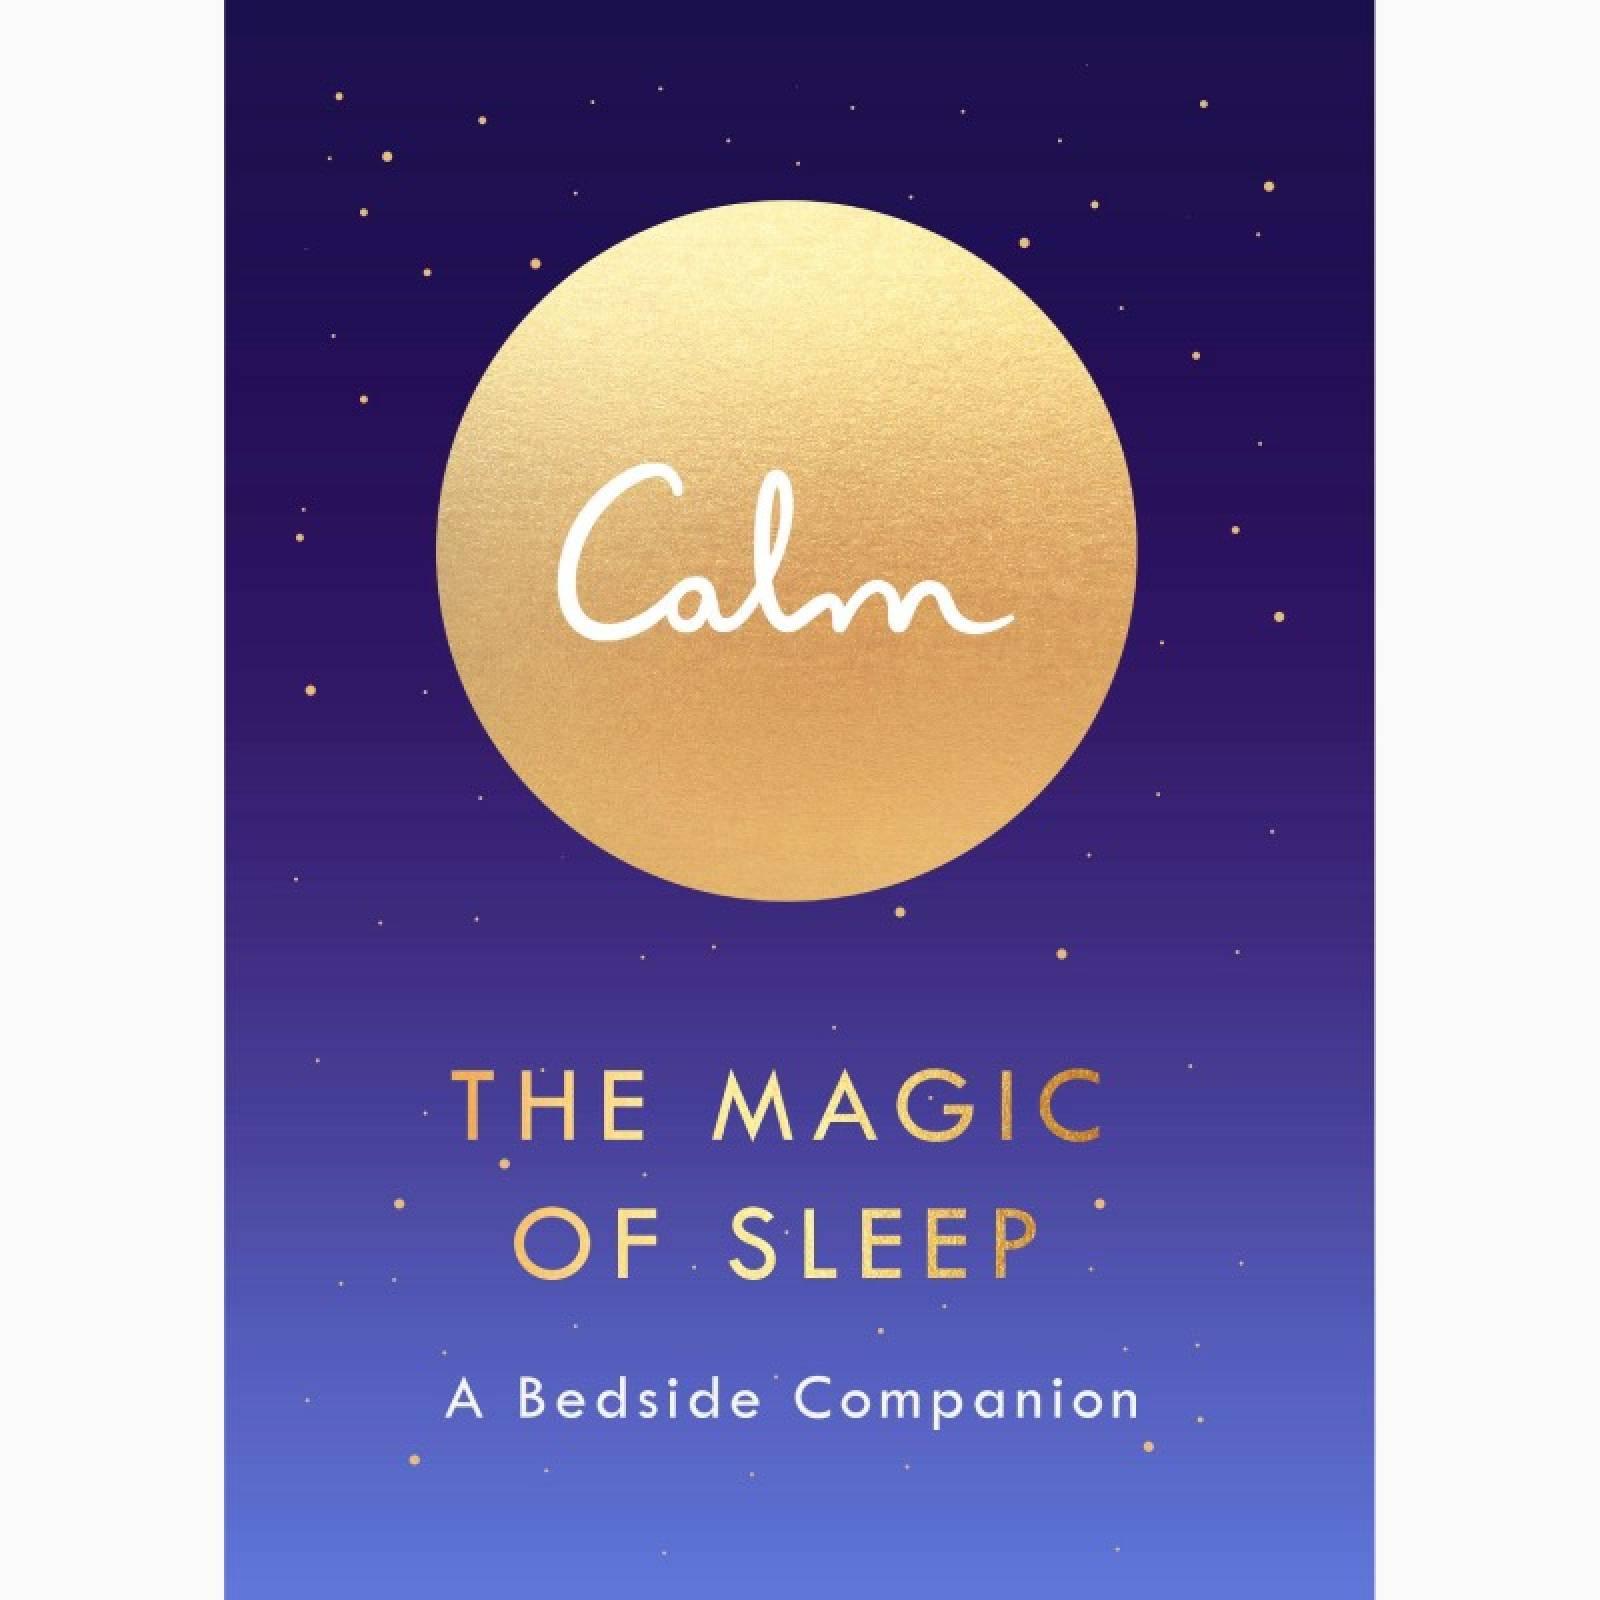 The Magic of Sleep: A Bedside Companion - Paperback Book